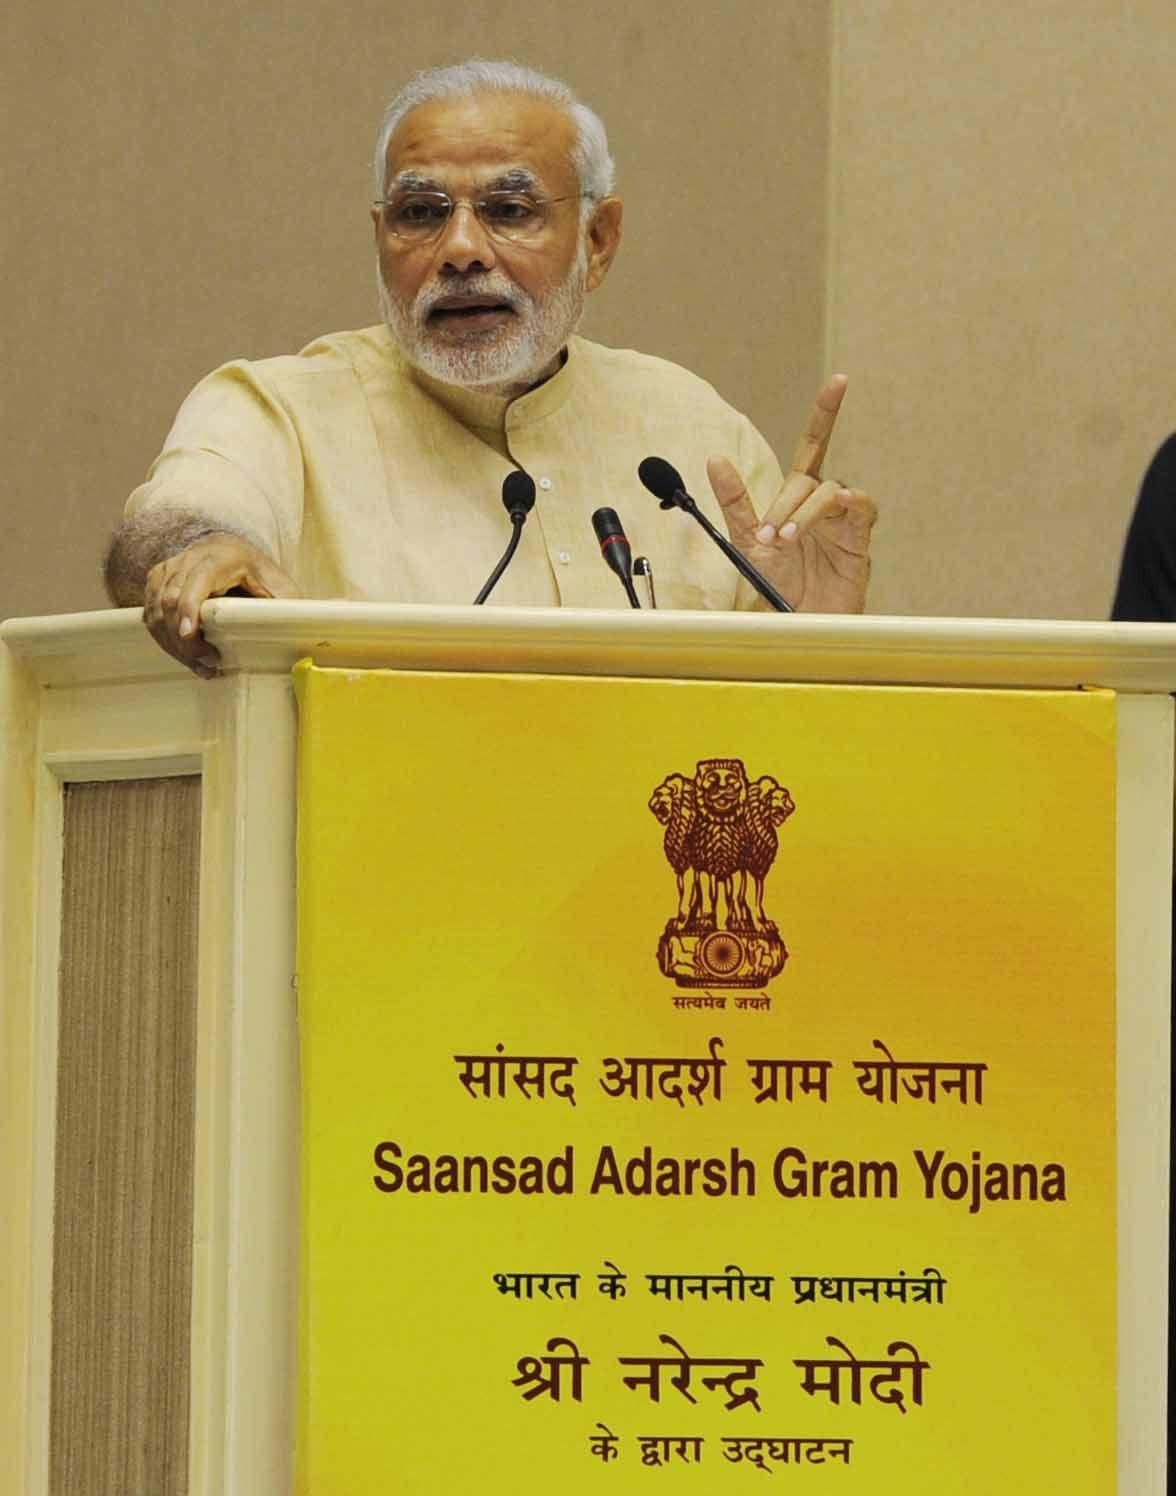 PM Modi on 2-day visit to Gujarat